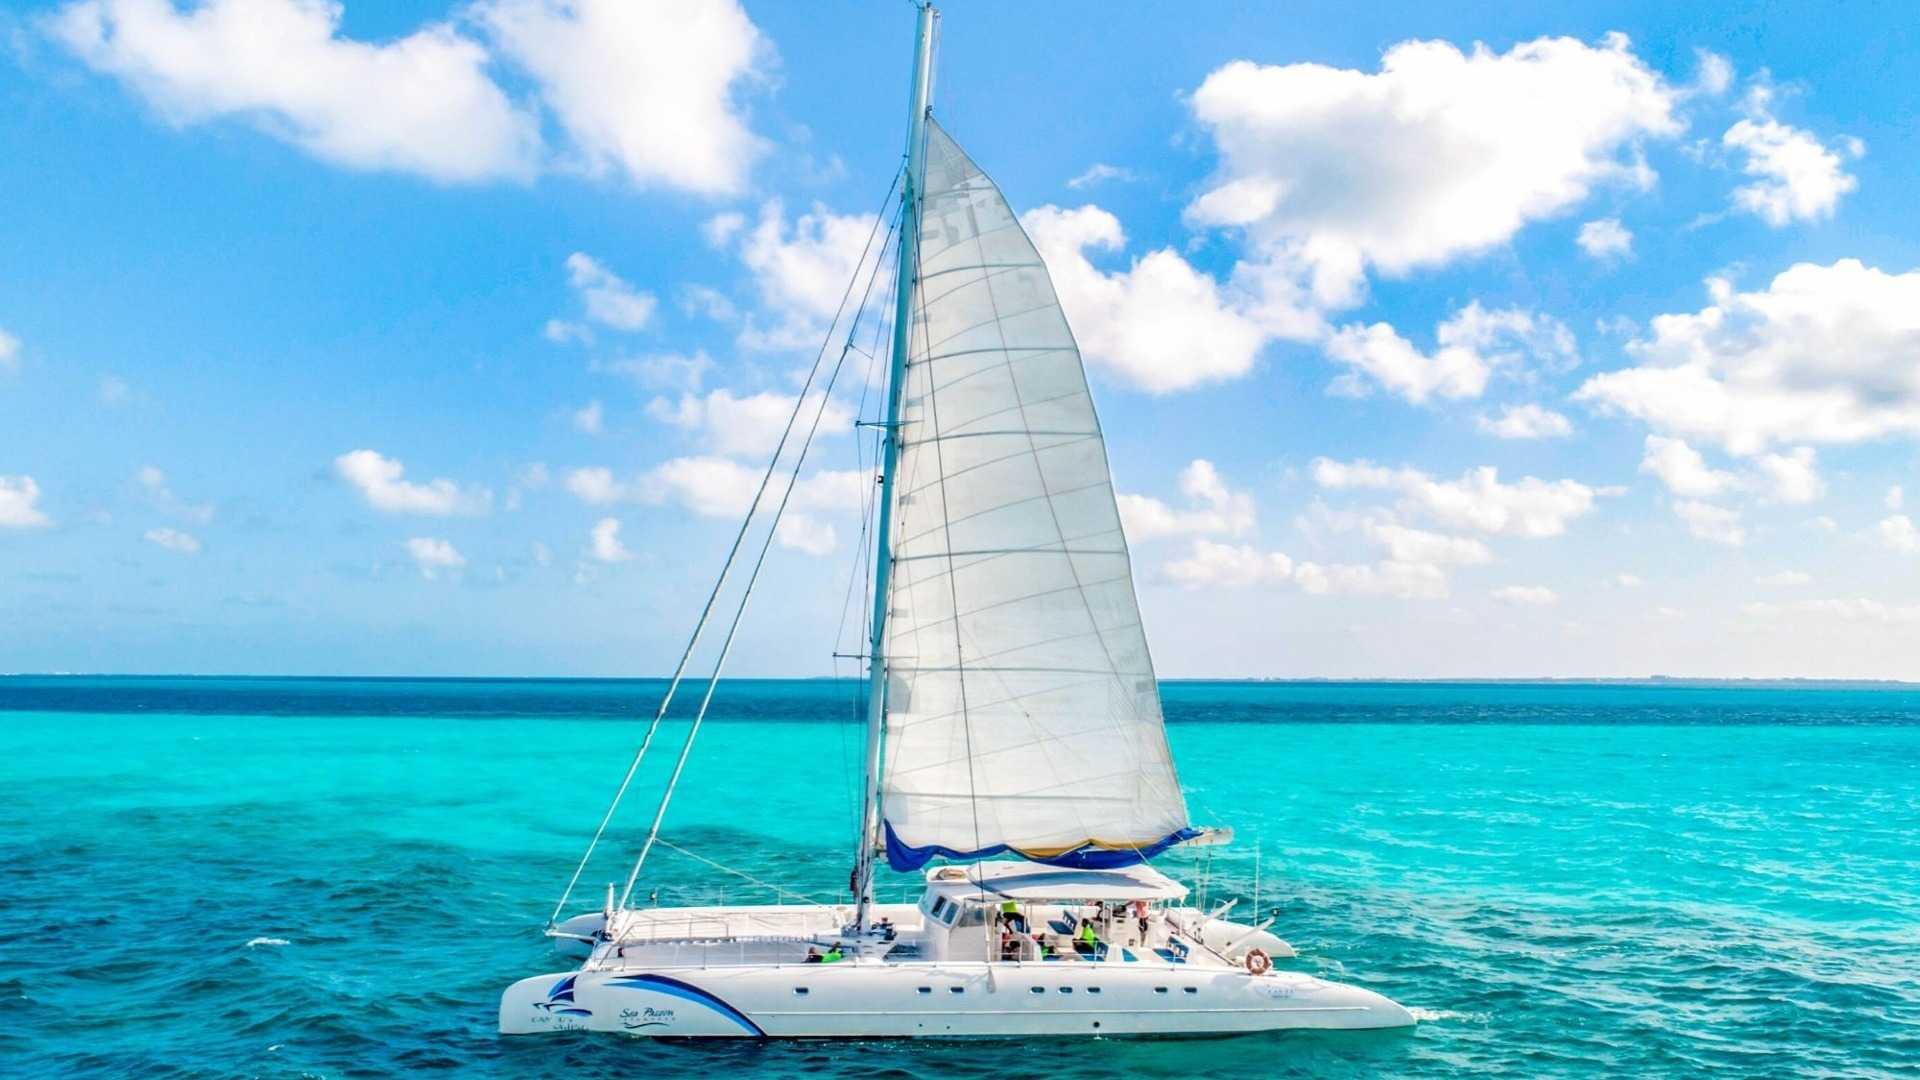 7 - LowRes - Sea Passion III - Isla Mujeres Catamaran Tour - Cancun Sailing